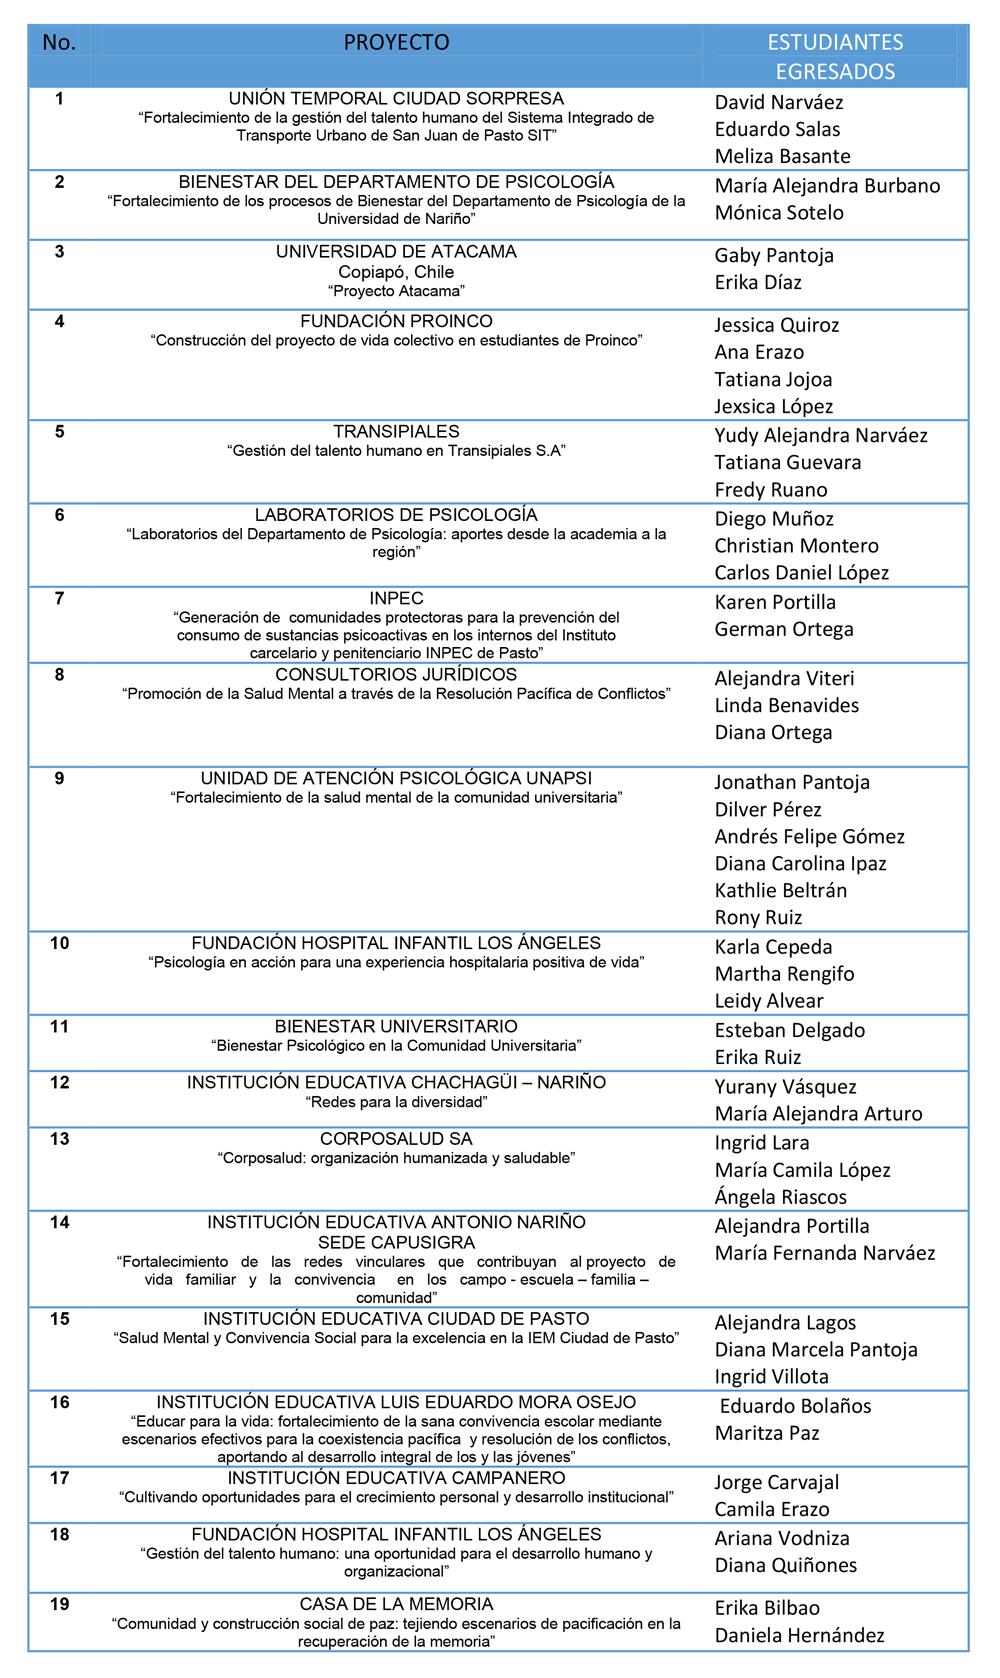 asignacion-pratica-profesional-psicologia-tabla-1